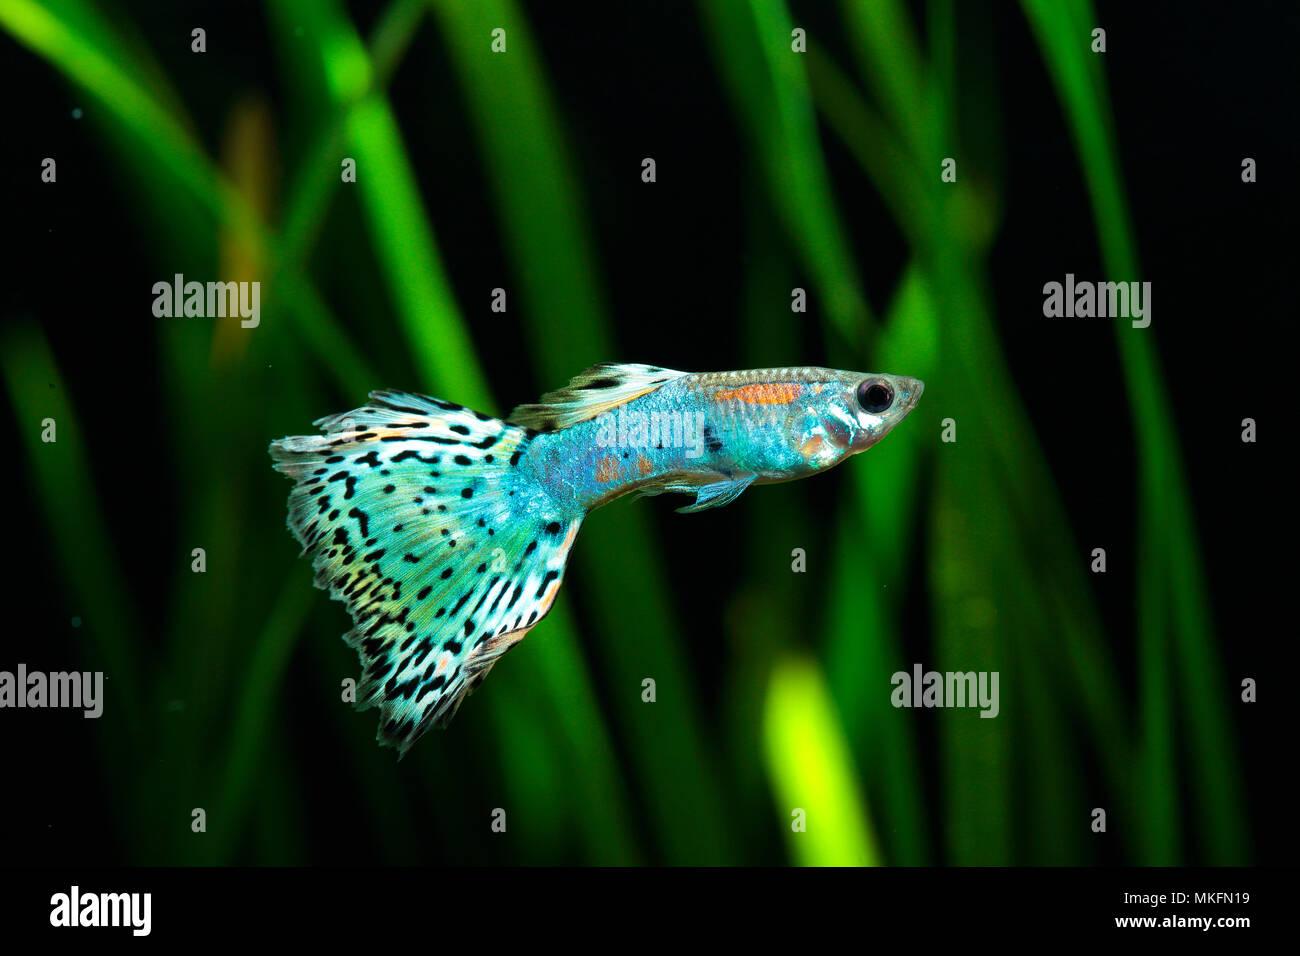 Guppy (Poecilia reticulata) 'Calico blue pink' male profil in aquarium Stock Photo